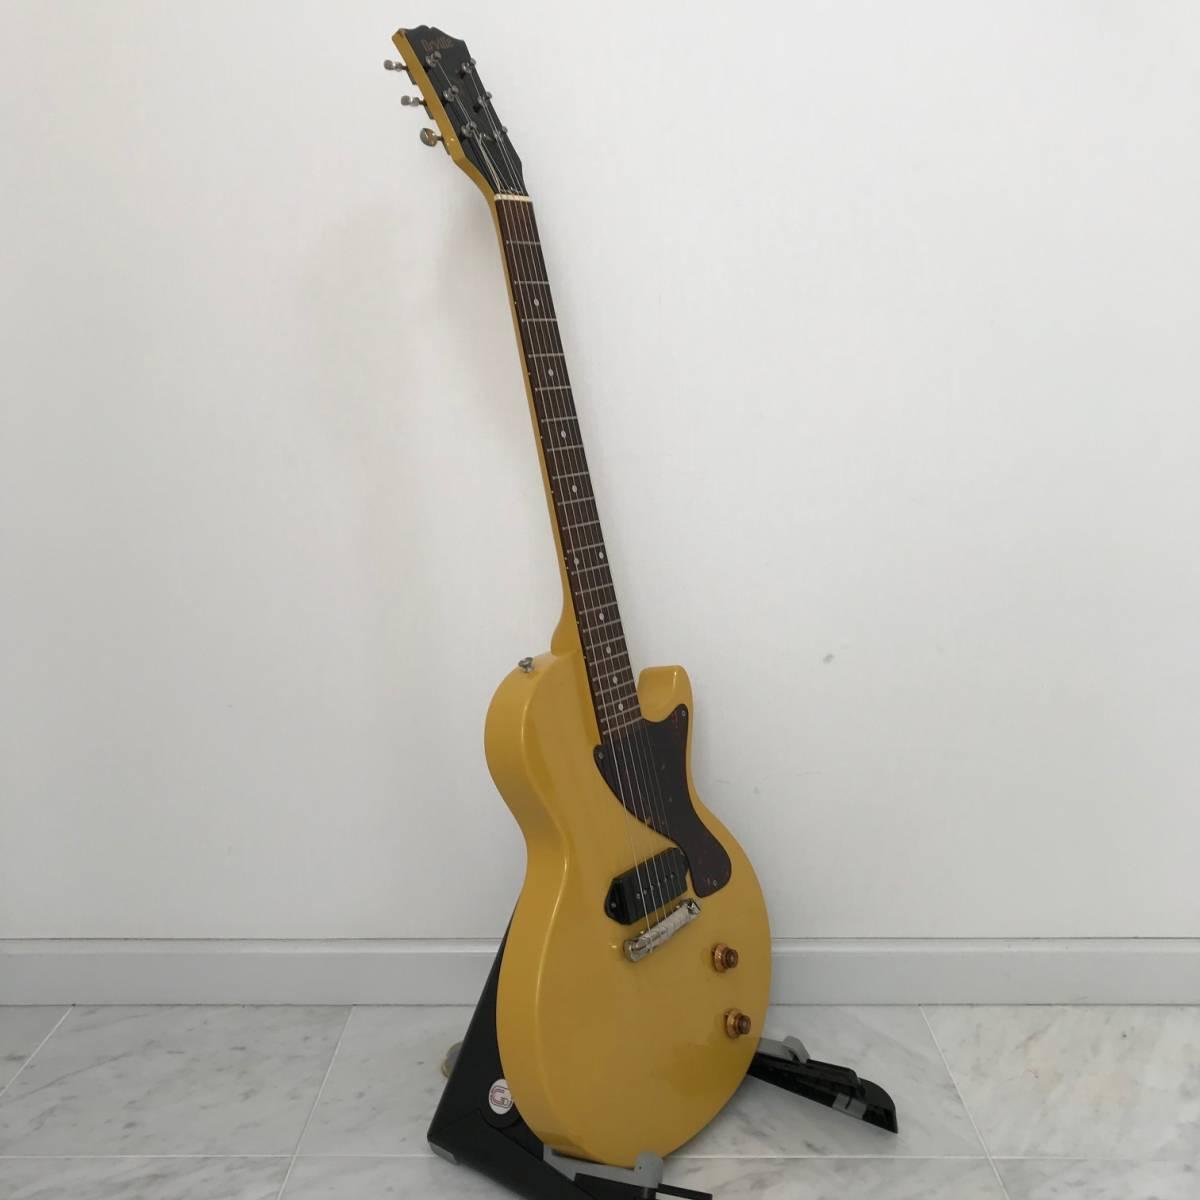 Orville by Gibson Les Paul Junior オービル バイ ギブソン レスポールジュニア イエロー 重量3.6kg_画像5